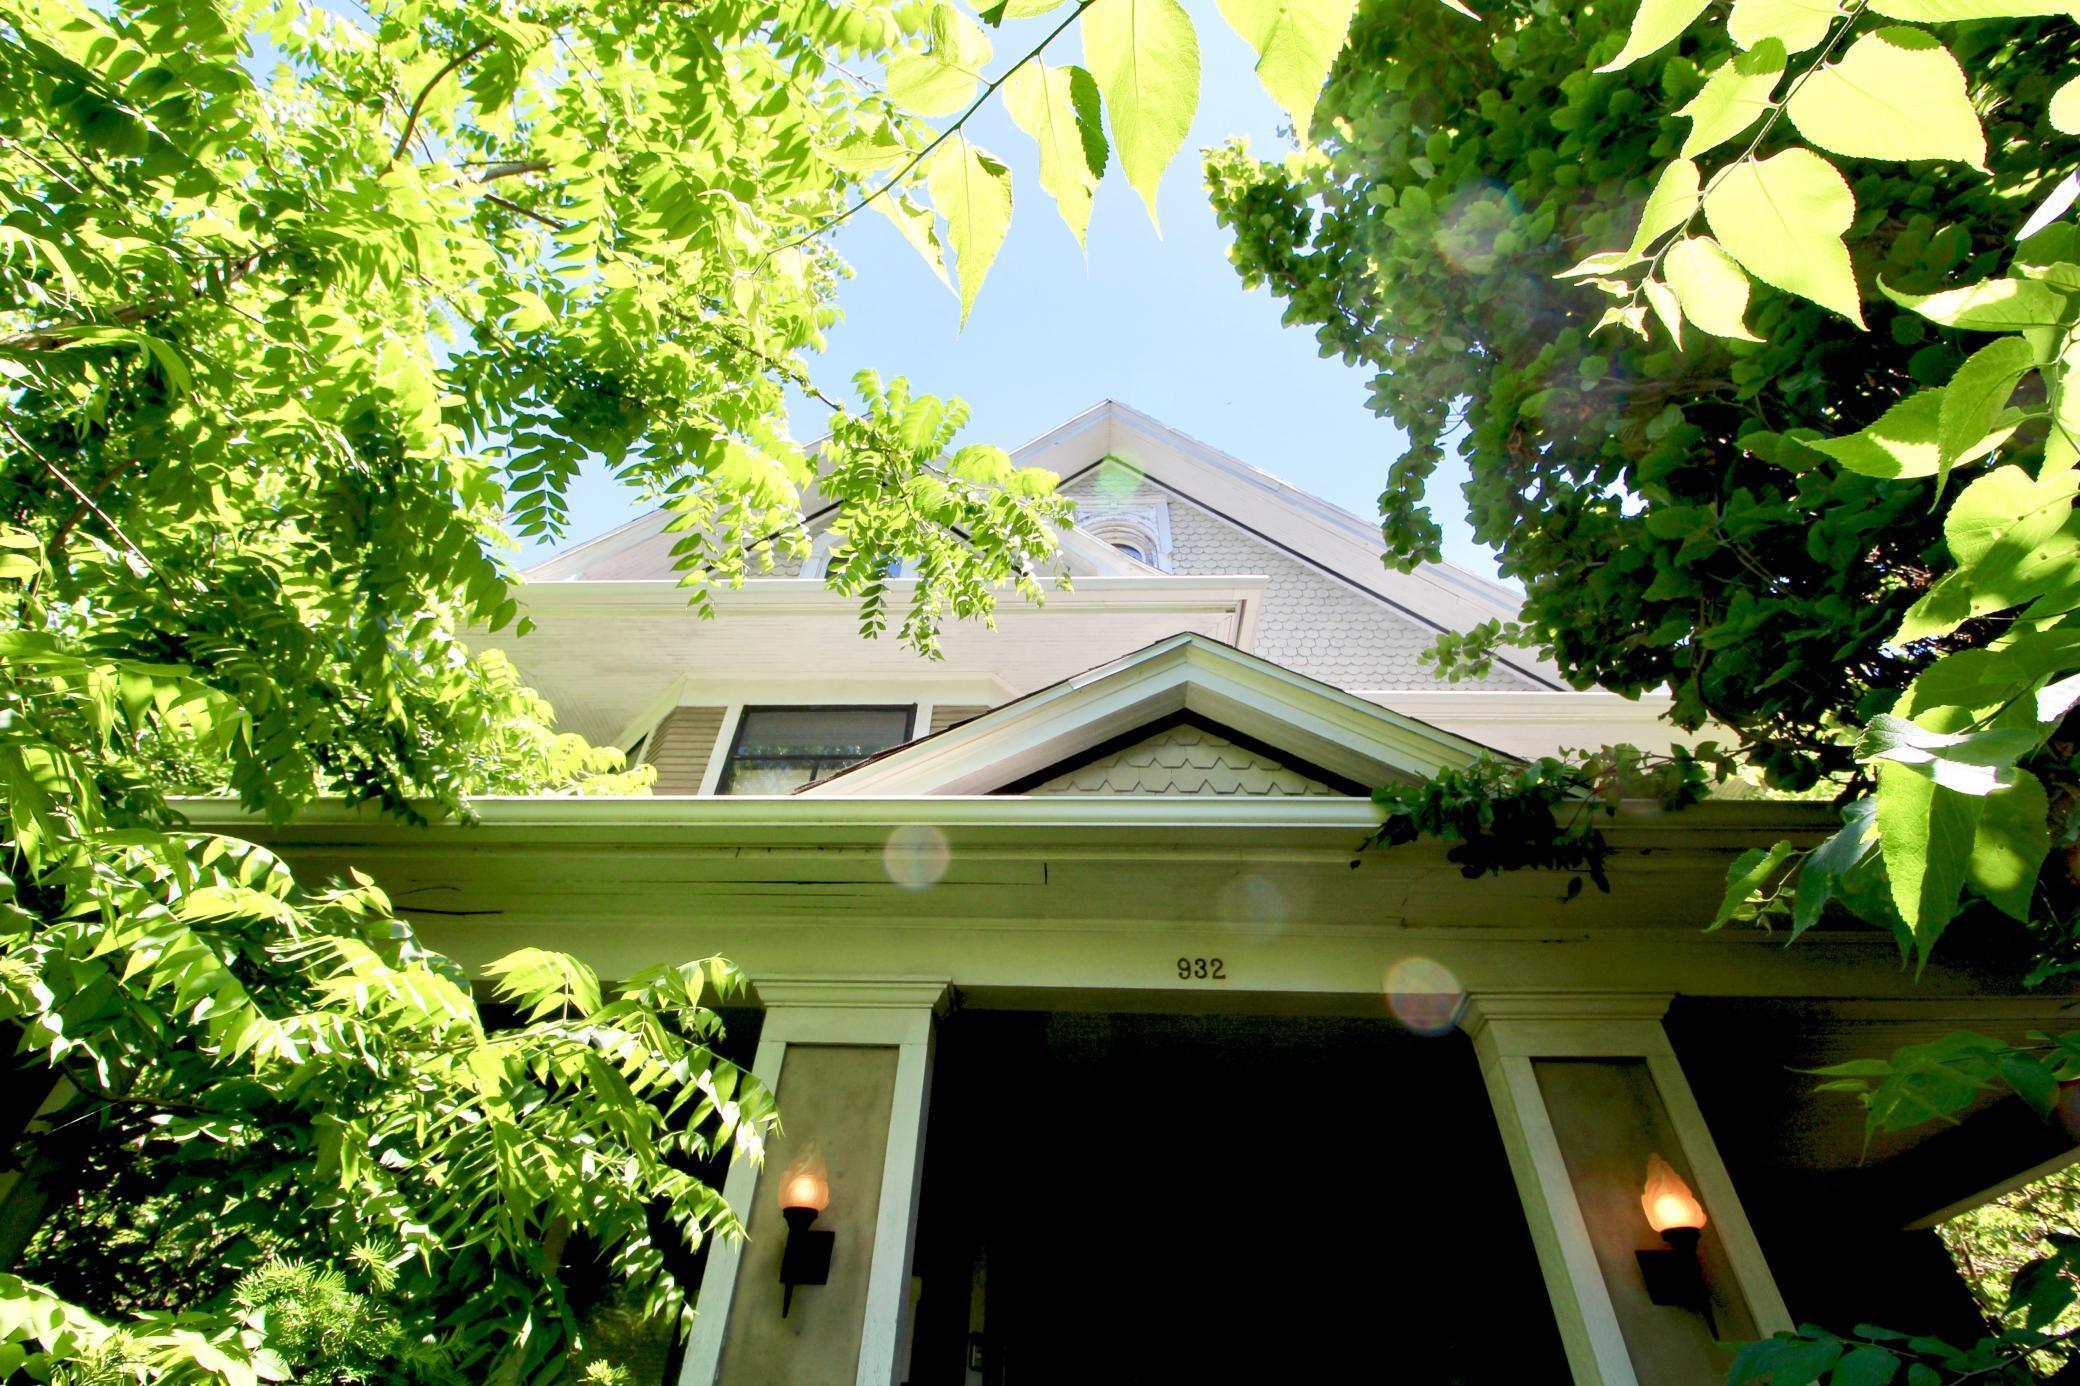 932 Elm, Grinnell, Iowa 50112-2035, 4 Bedrooms Bedrooms, ,2 BathroomsBathrooms,Single Family,For Sale,Elm,5611532